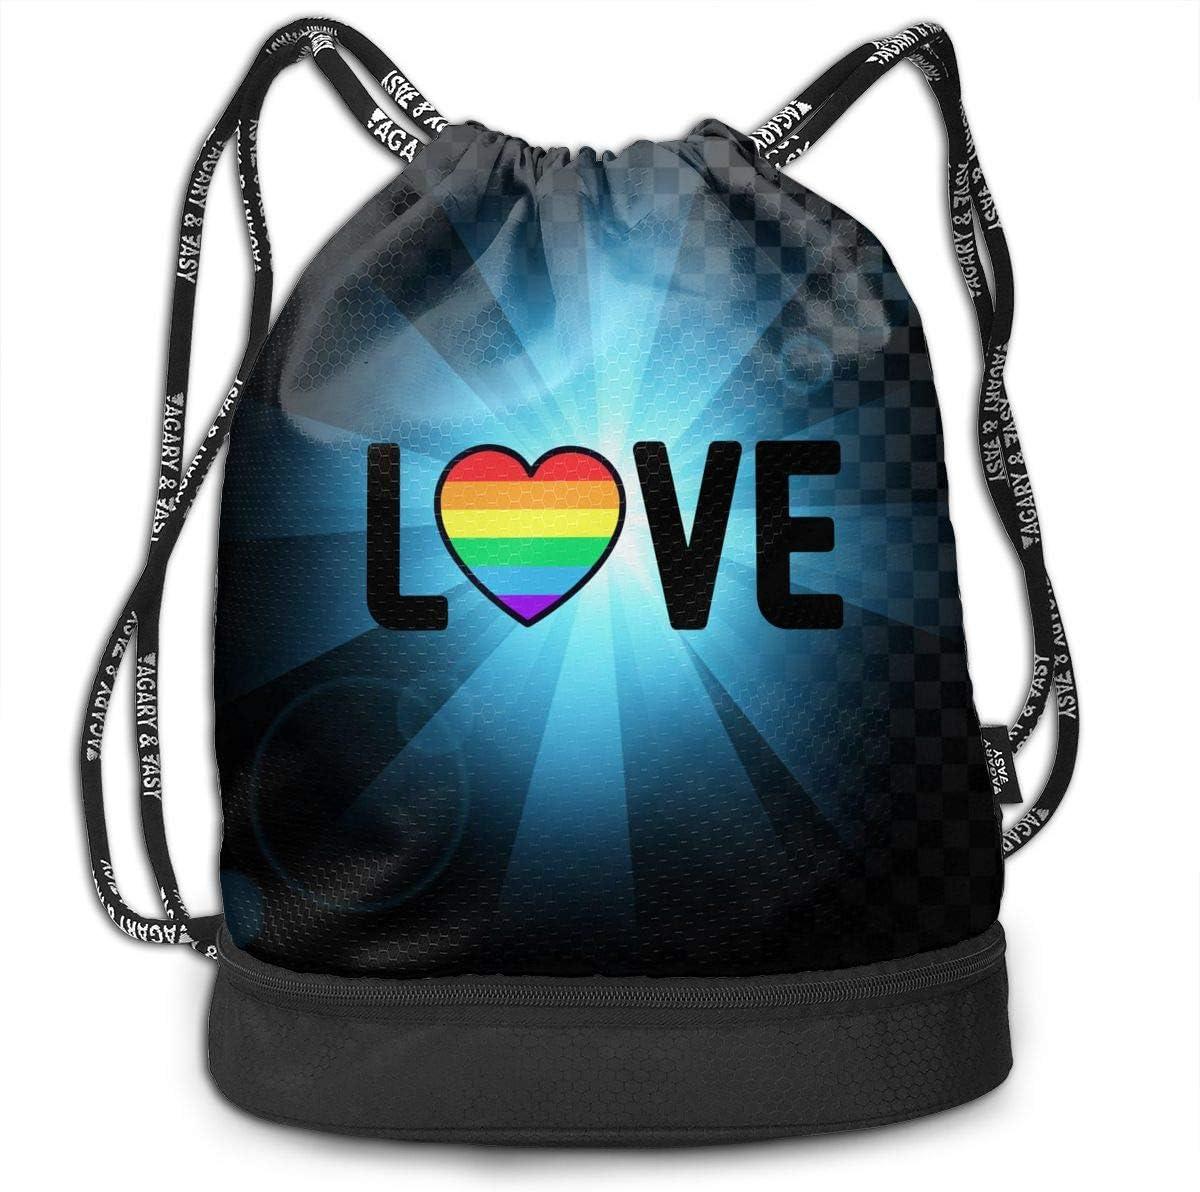 GAY PRIDE LOVE Men /& Women Drawstring Backpack Bag Beam Mouth Sport Bag Rucksack Shoulder Bags